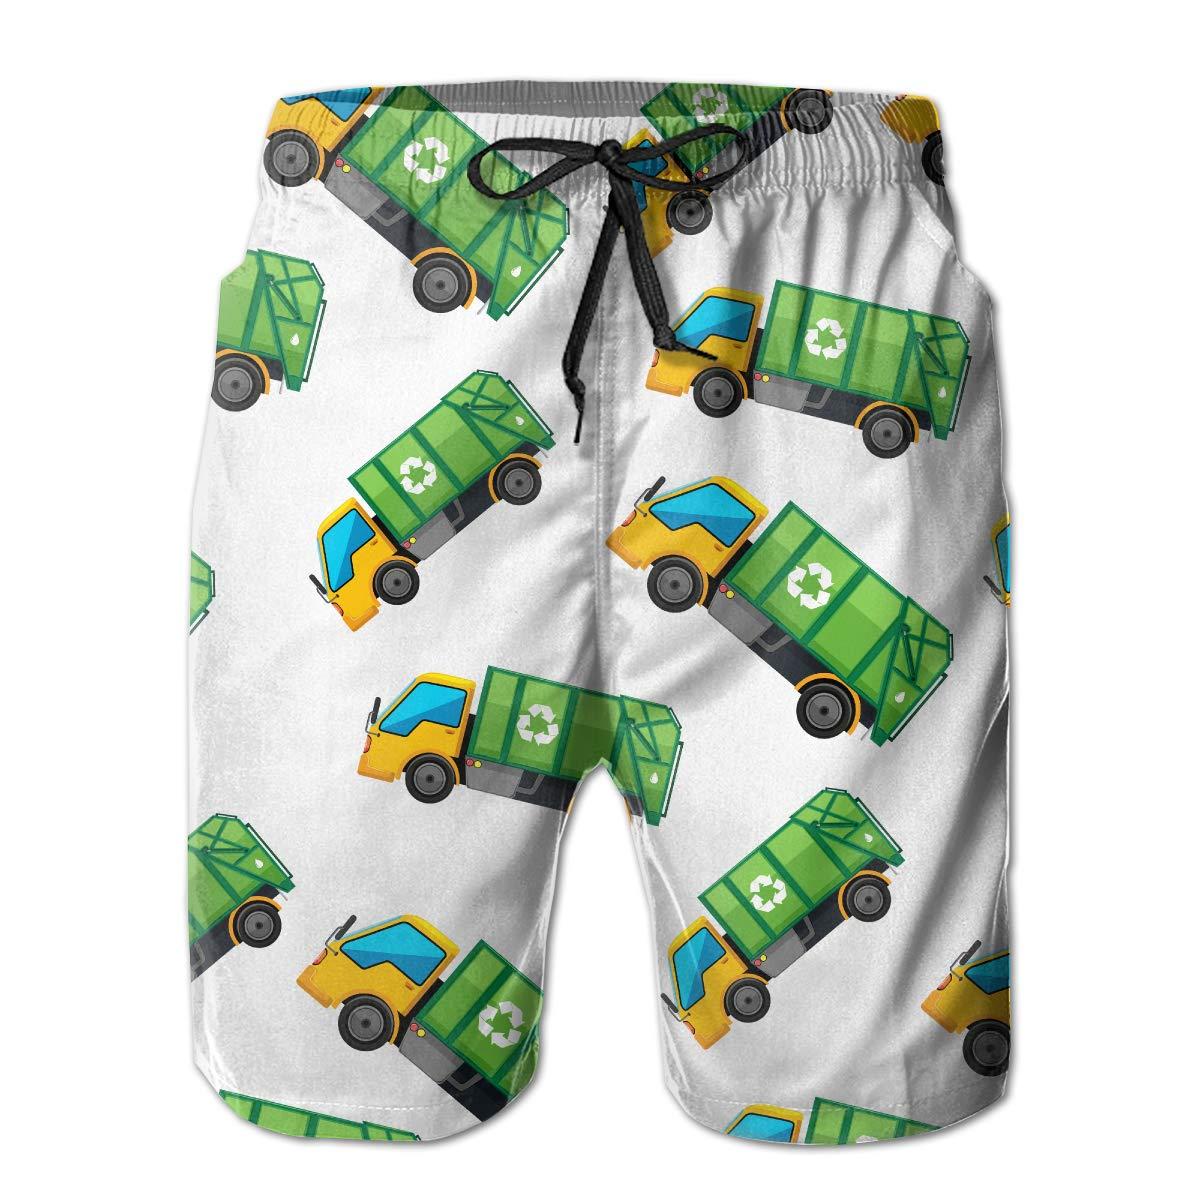 JF-X Cartoon Garbage Truck Mens Summer Beach Surf Board Shorts Quick Dry Swimming Trunks Casual Loose Sleep Short Pants